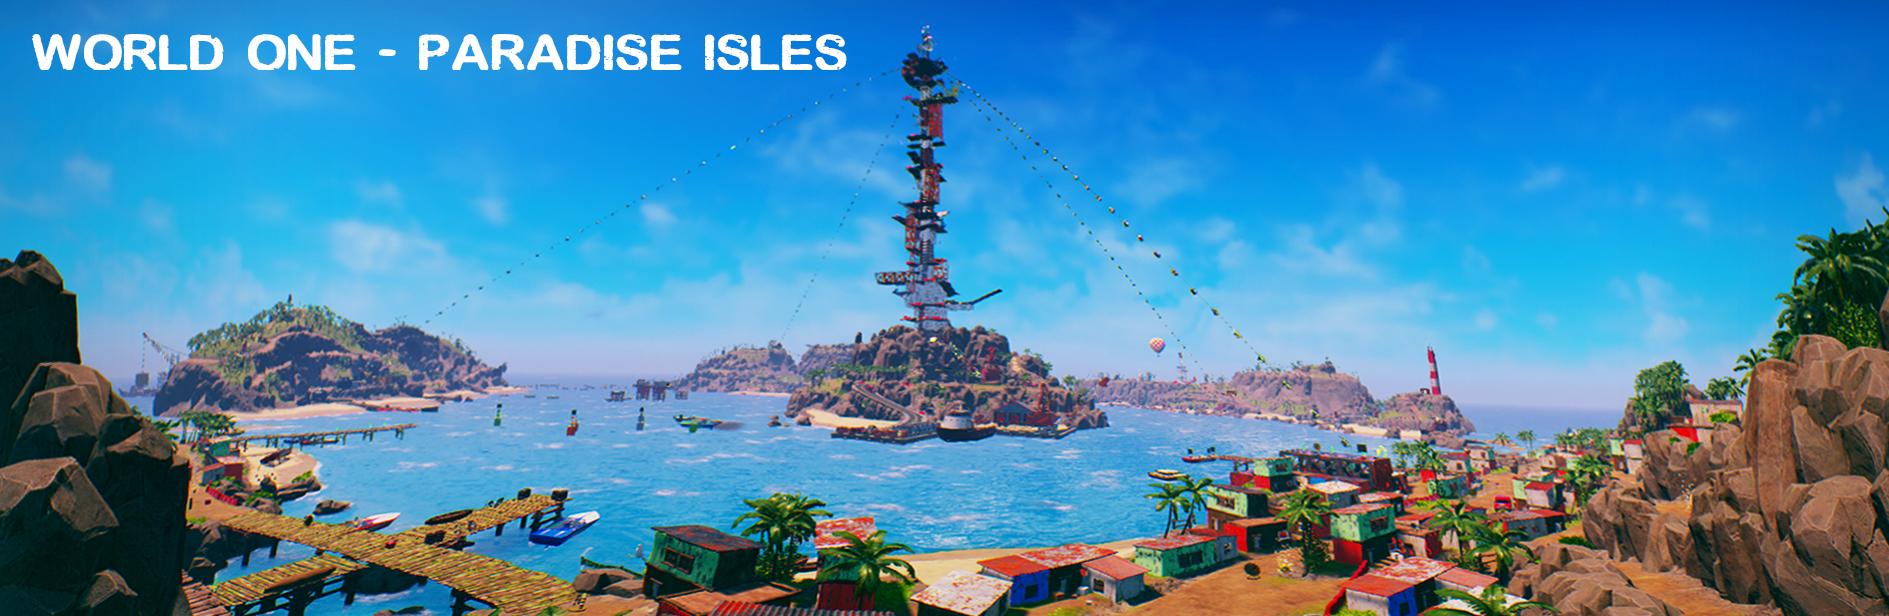 Panorama Shot Paradise Isles